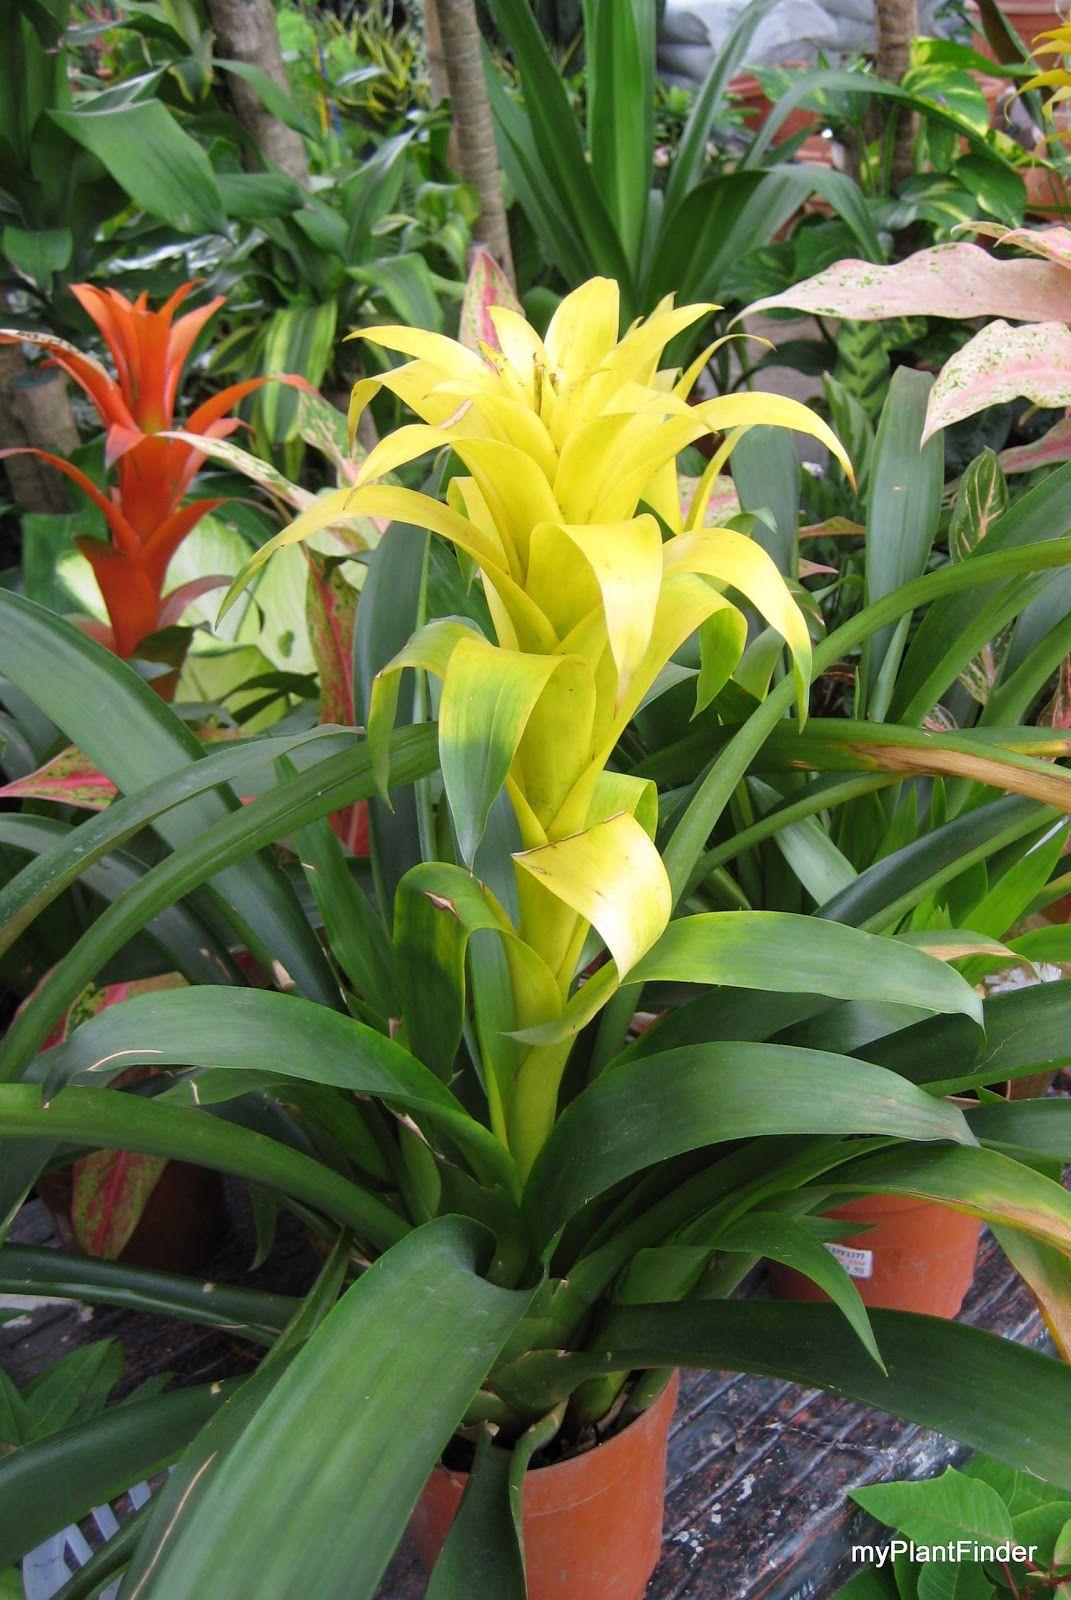 guzmania lingulata, bromeliad, central america | tropical plants